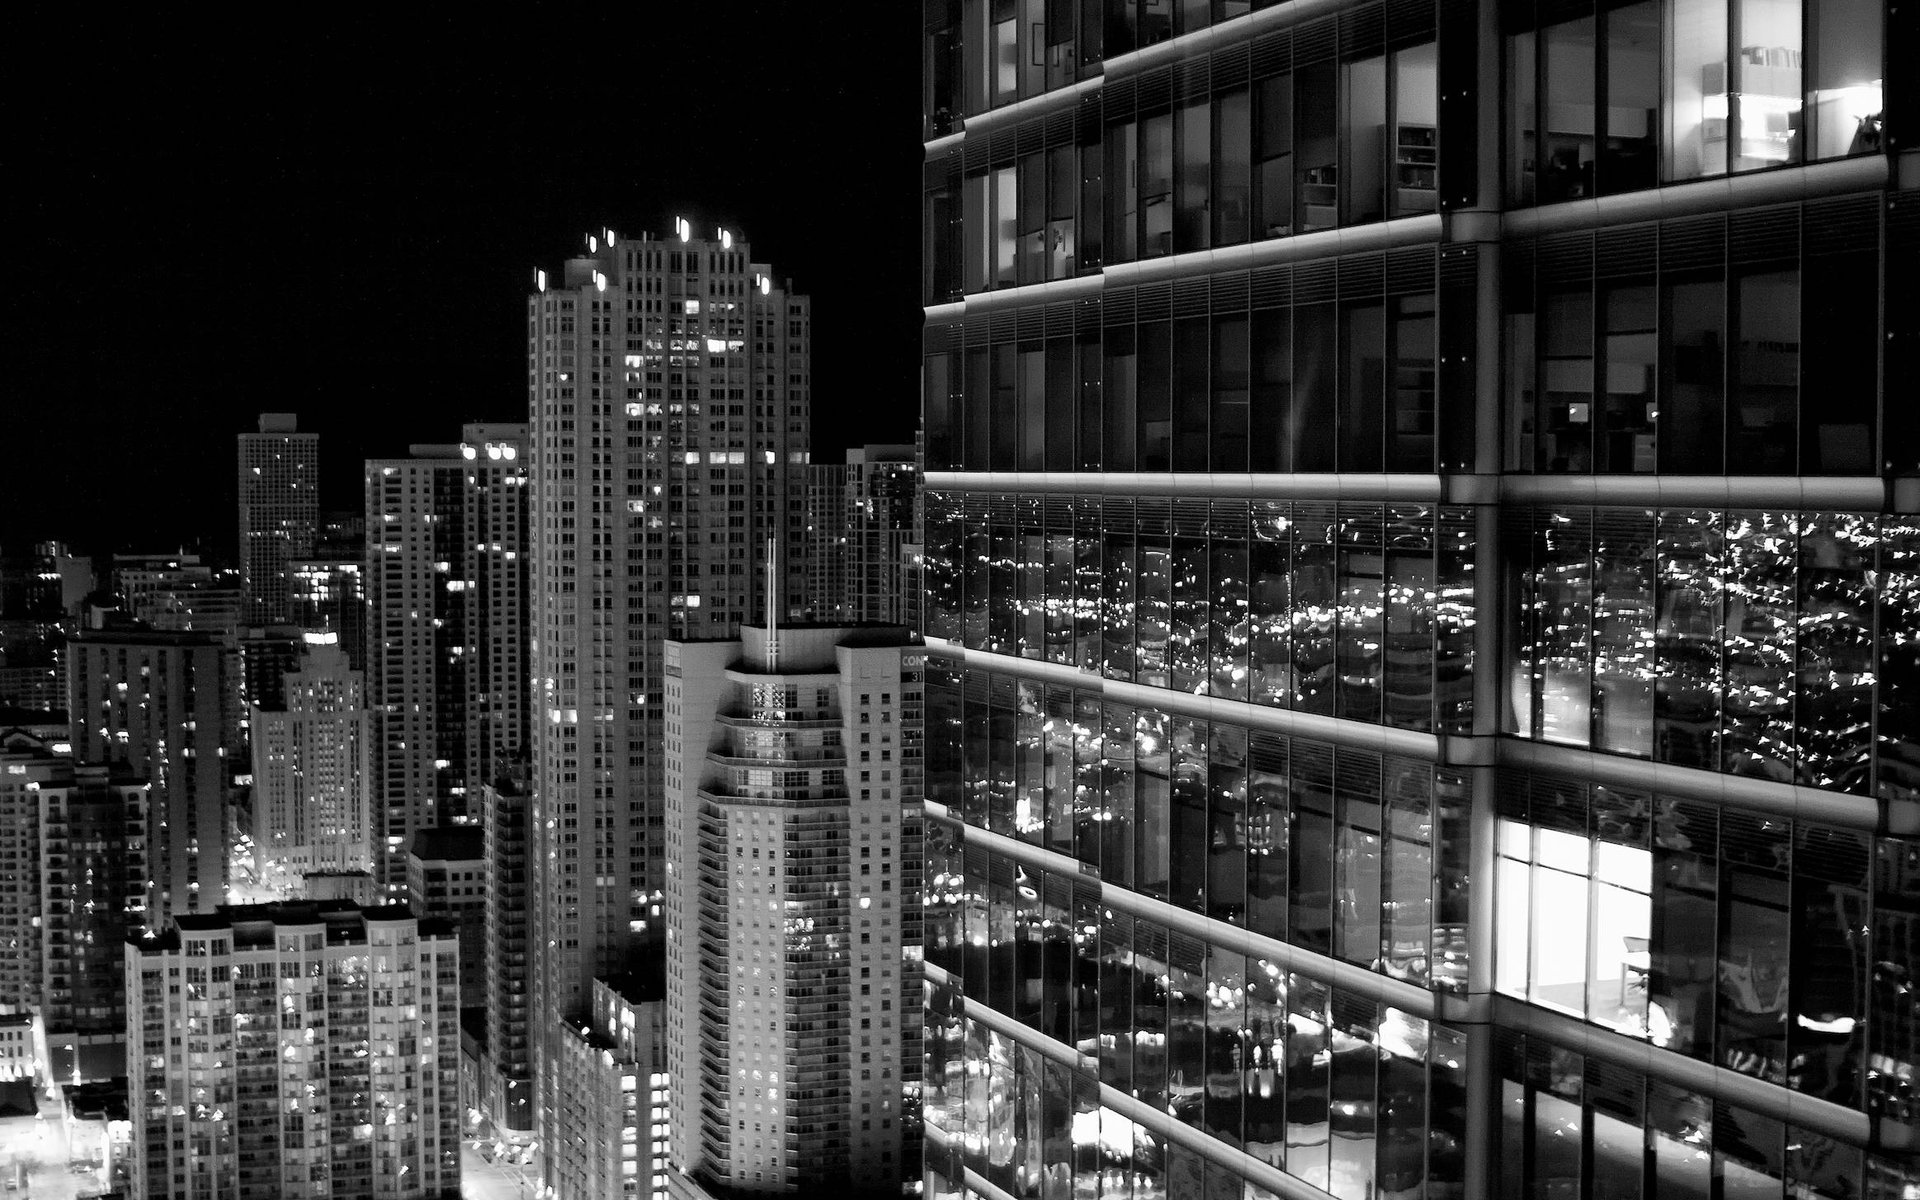 Black and White Cityscape Wallpaper - WallpaperSafari